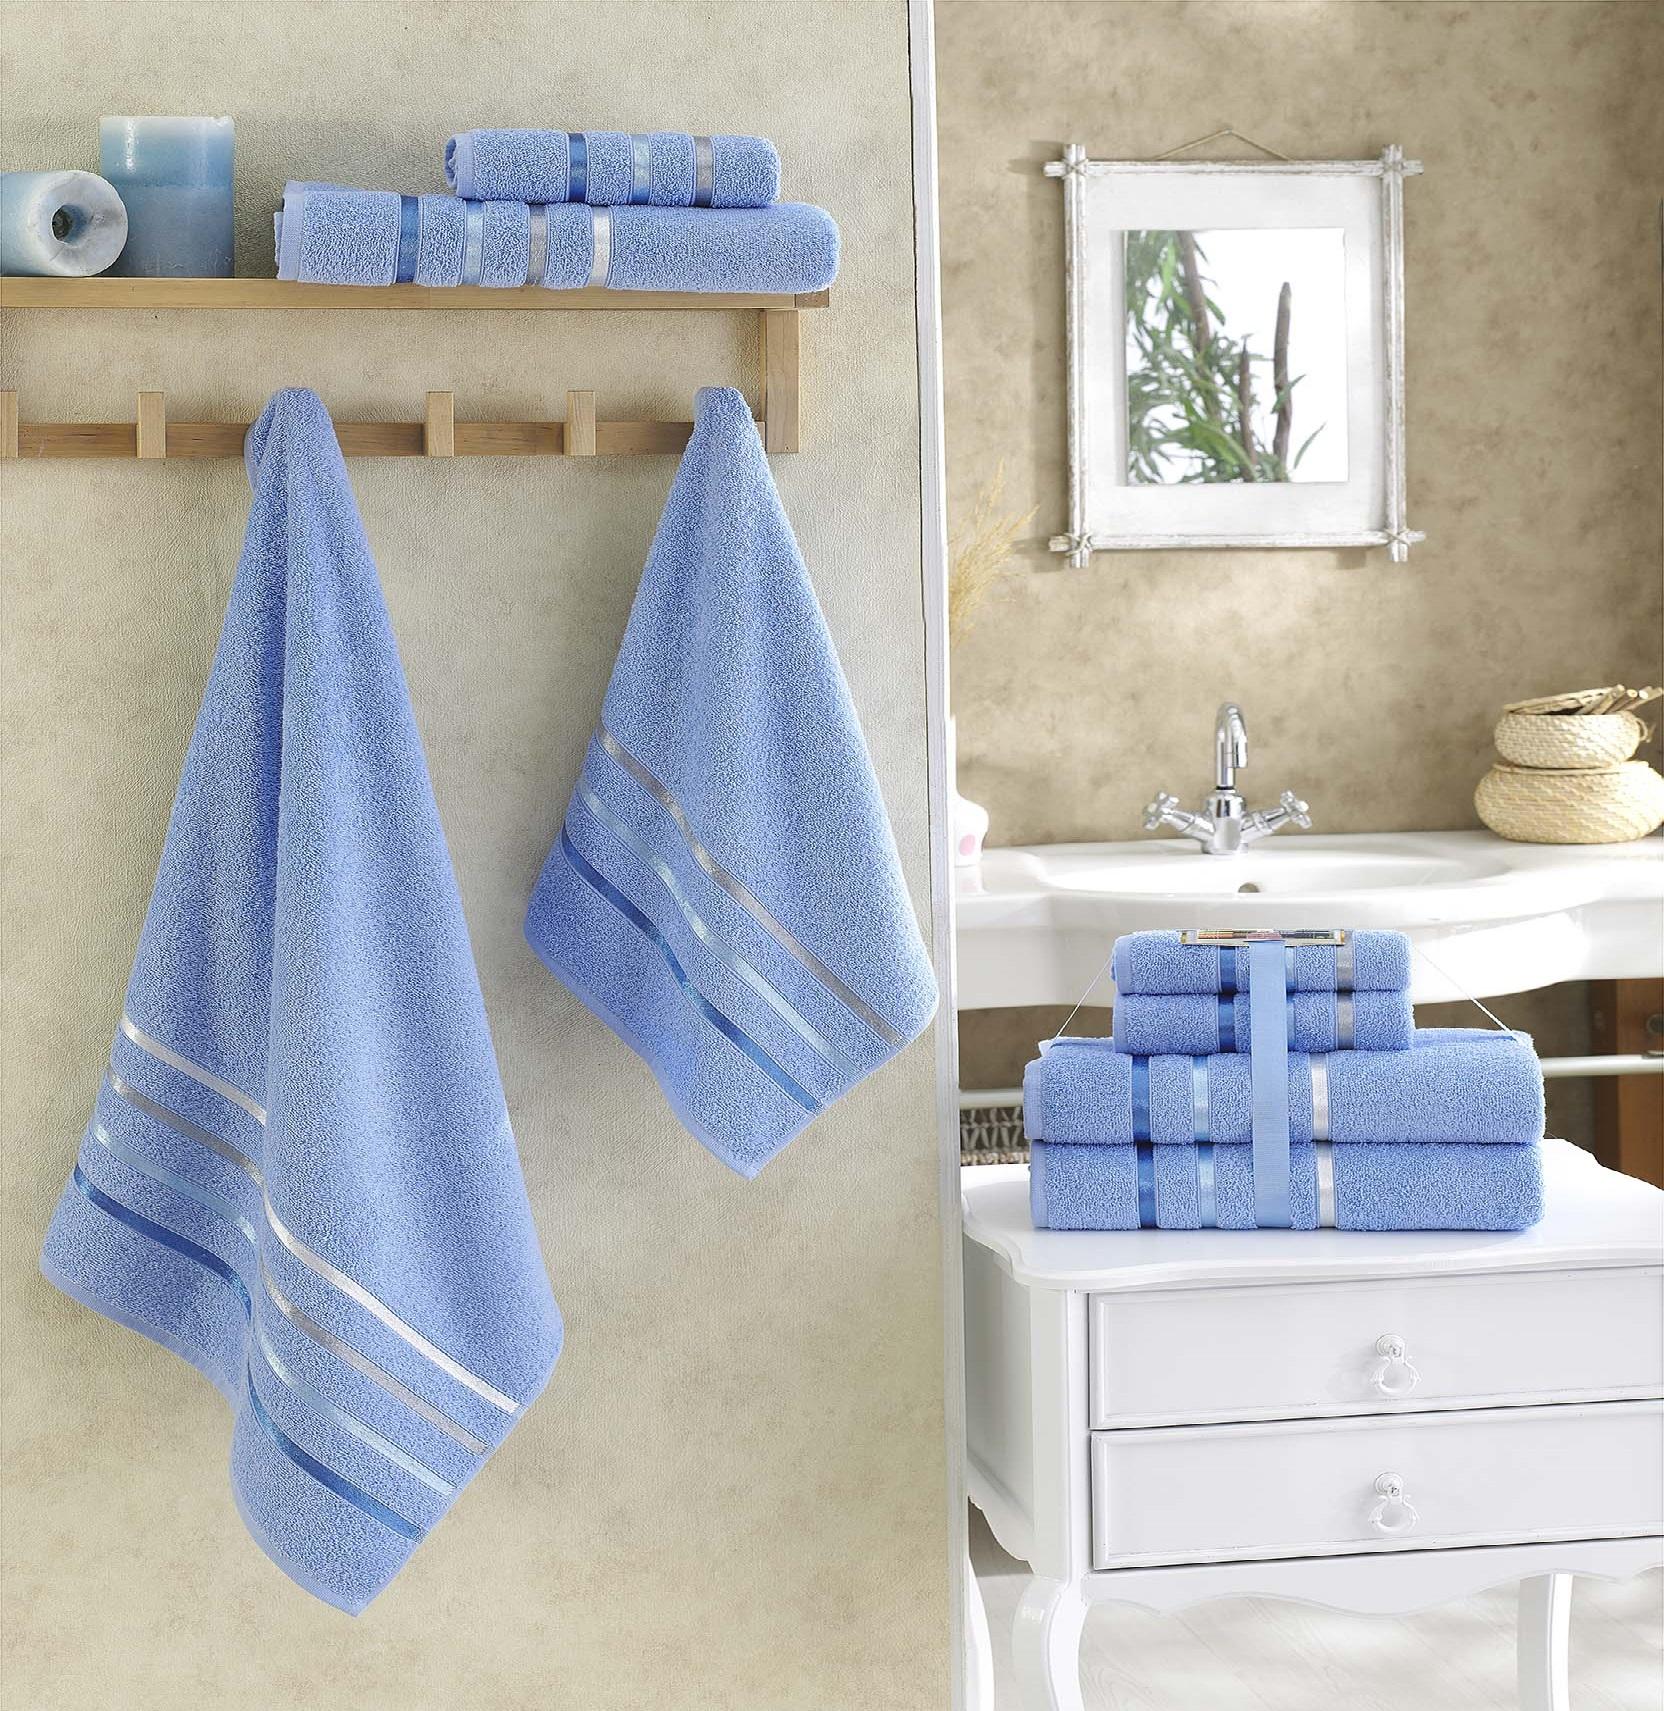 Полотенца Karna Полотенце Bale Цвет: Голубой (Набор) полотенца karna полотенце bale цвет розовый набор